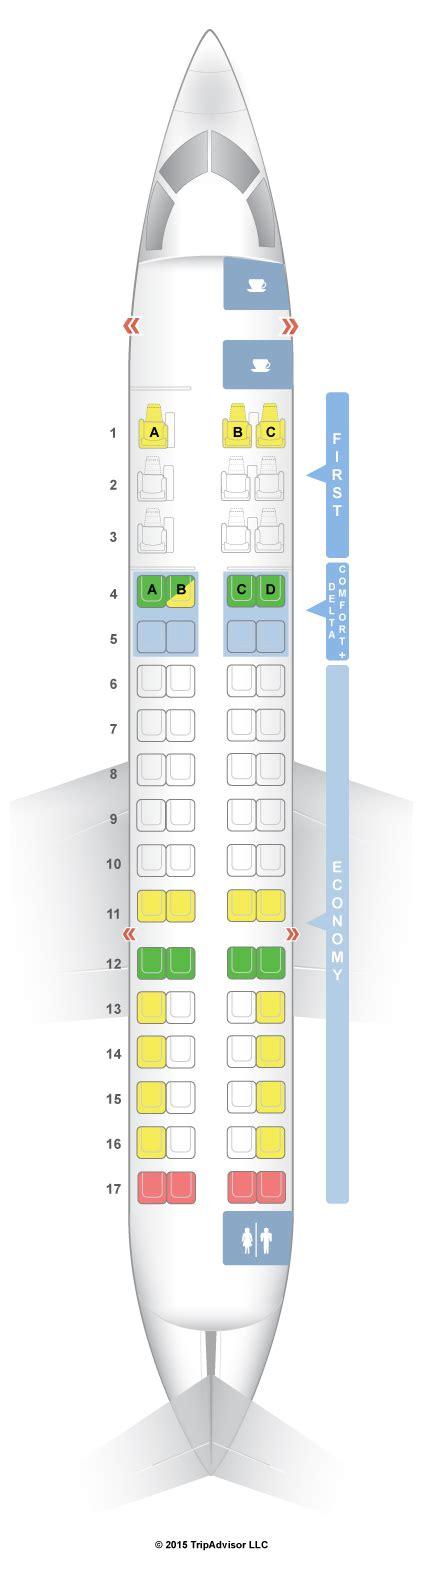 canadair regional jet seating seatguru seat map delta bombardier crj 700 cr7 v1